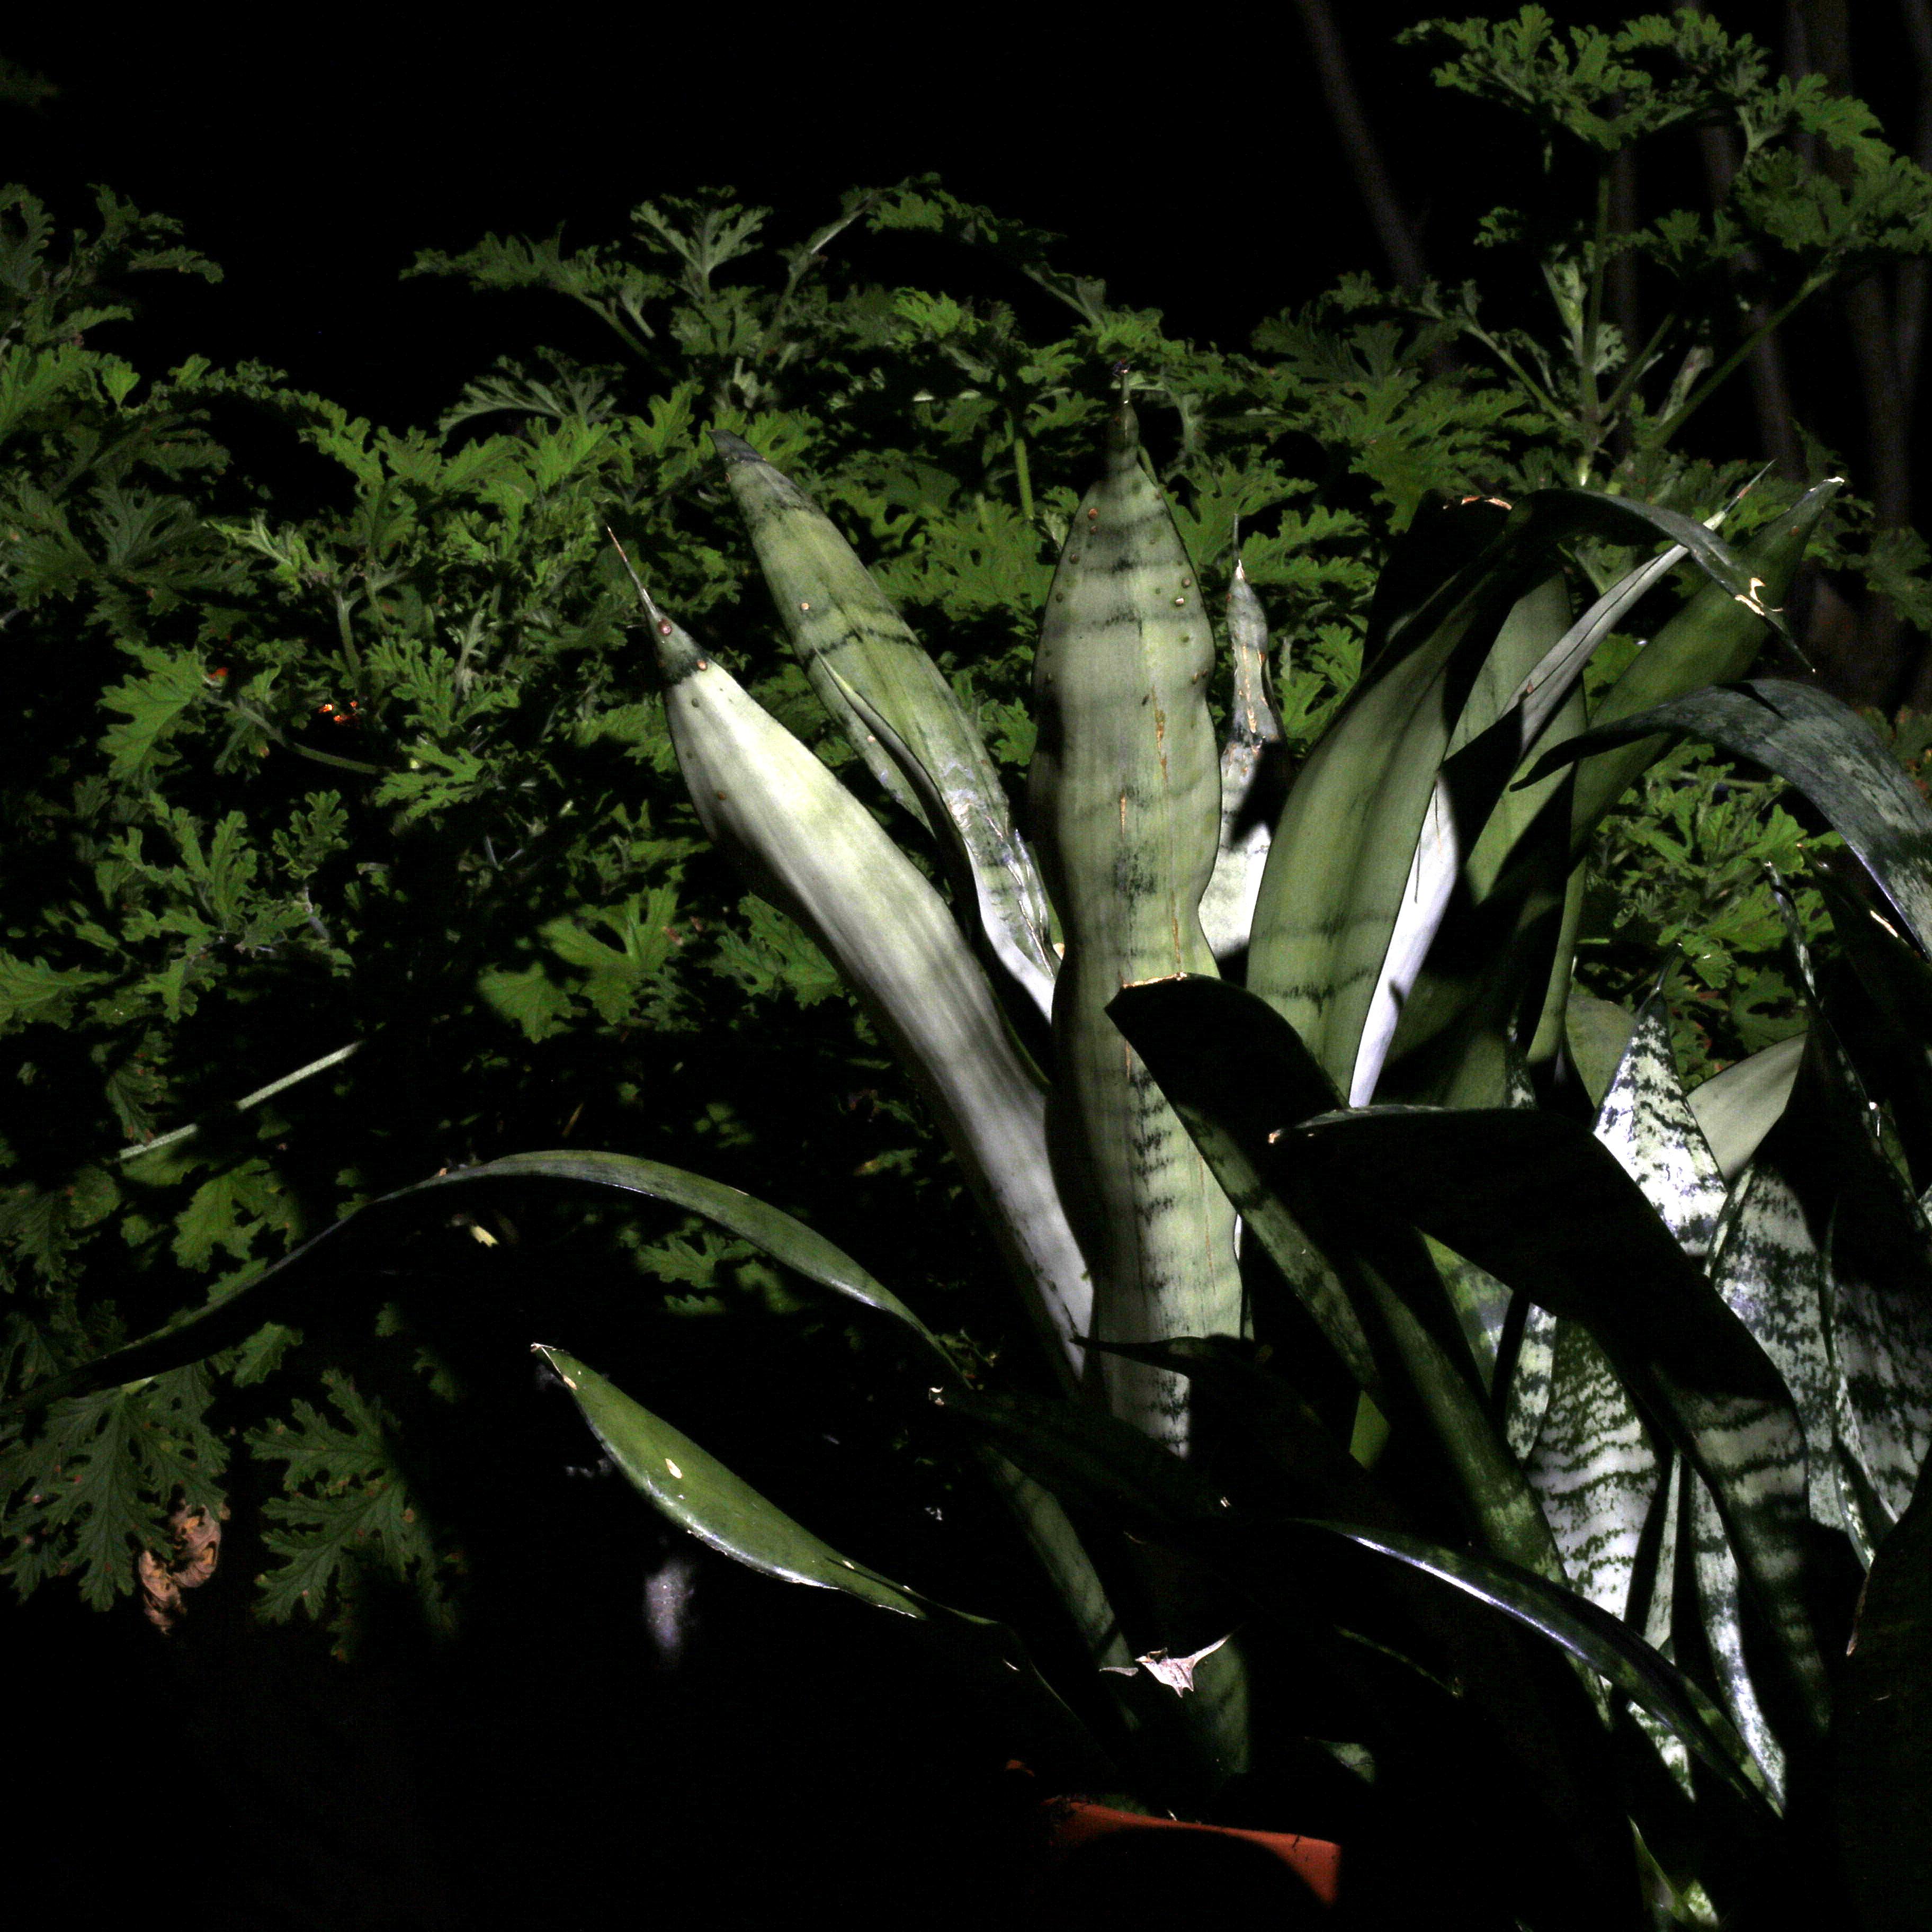 Photography ~ Gardening–Content Plants [Citronella & Sansevieria Trifasciata], 09/16